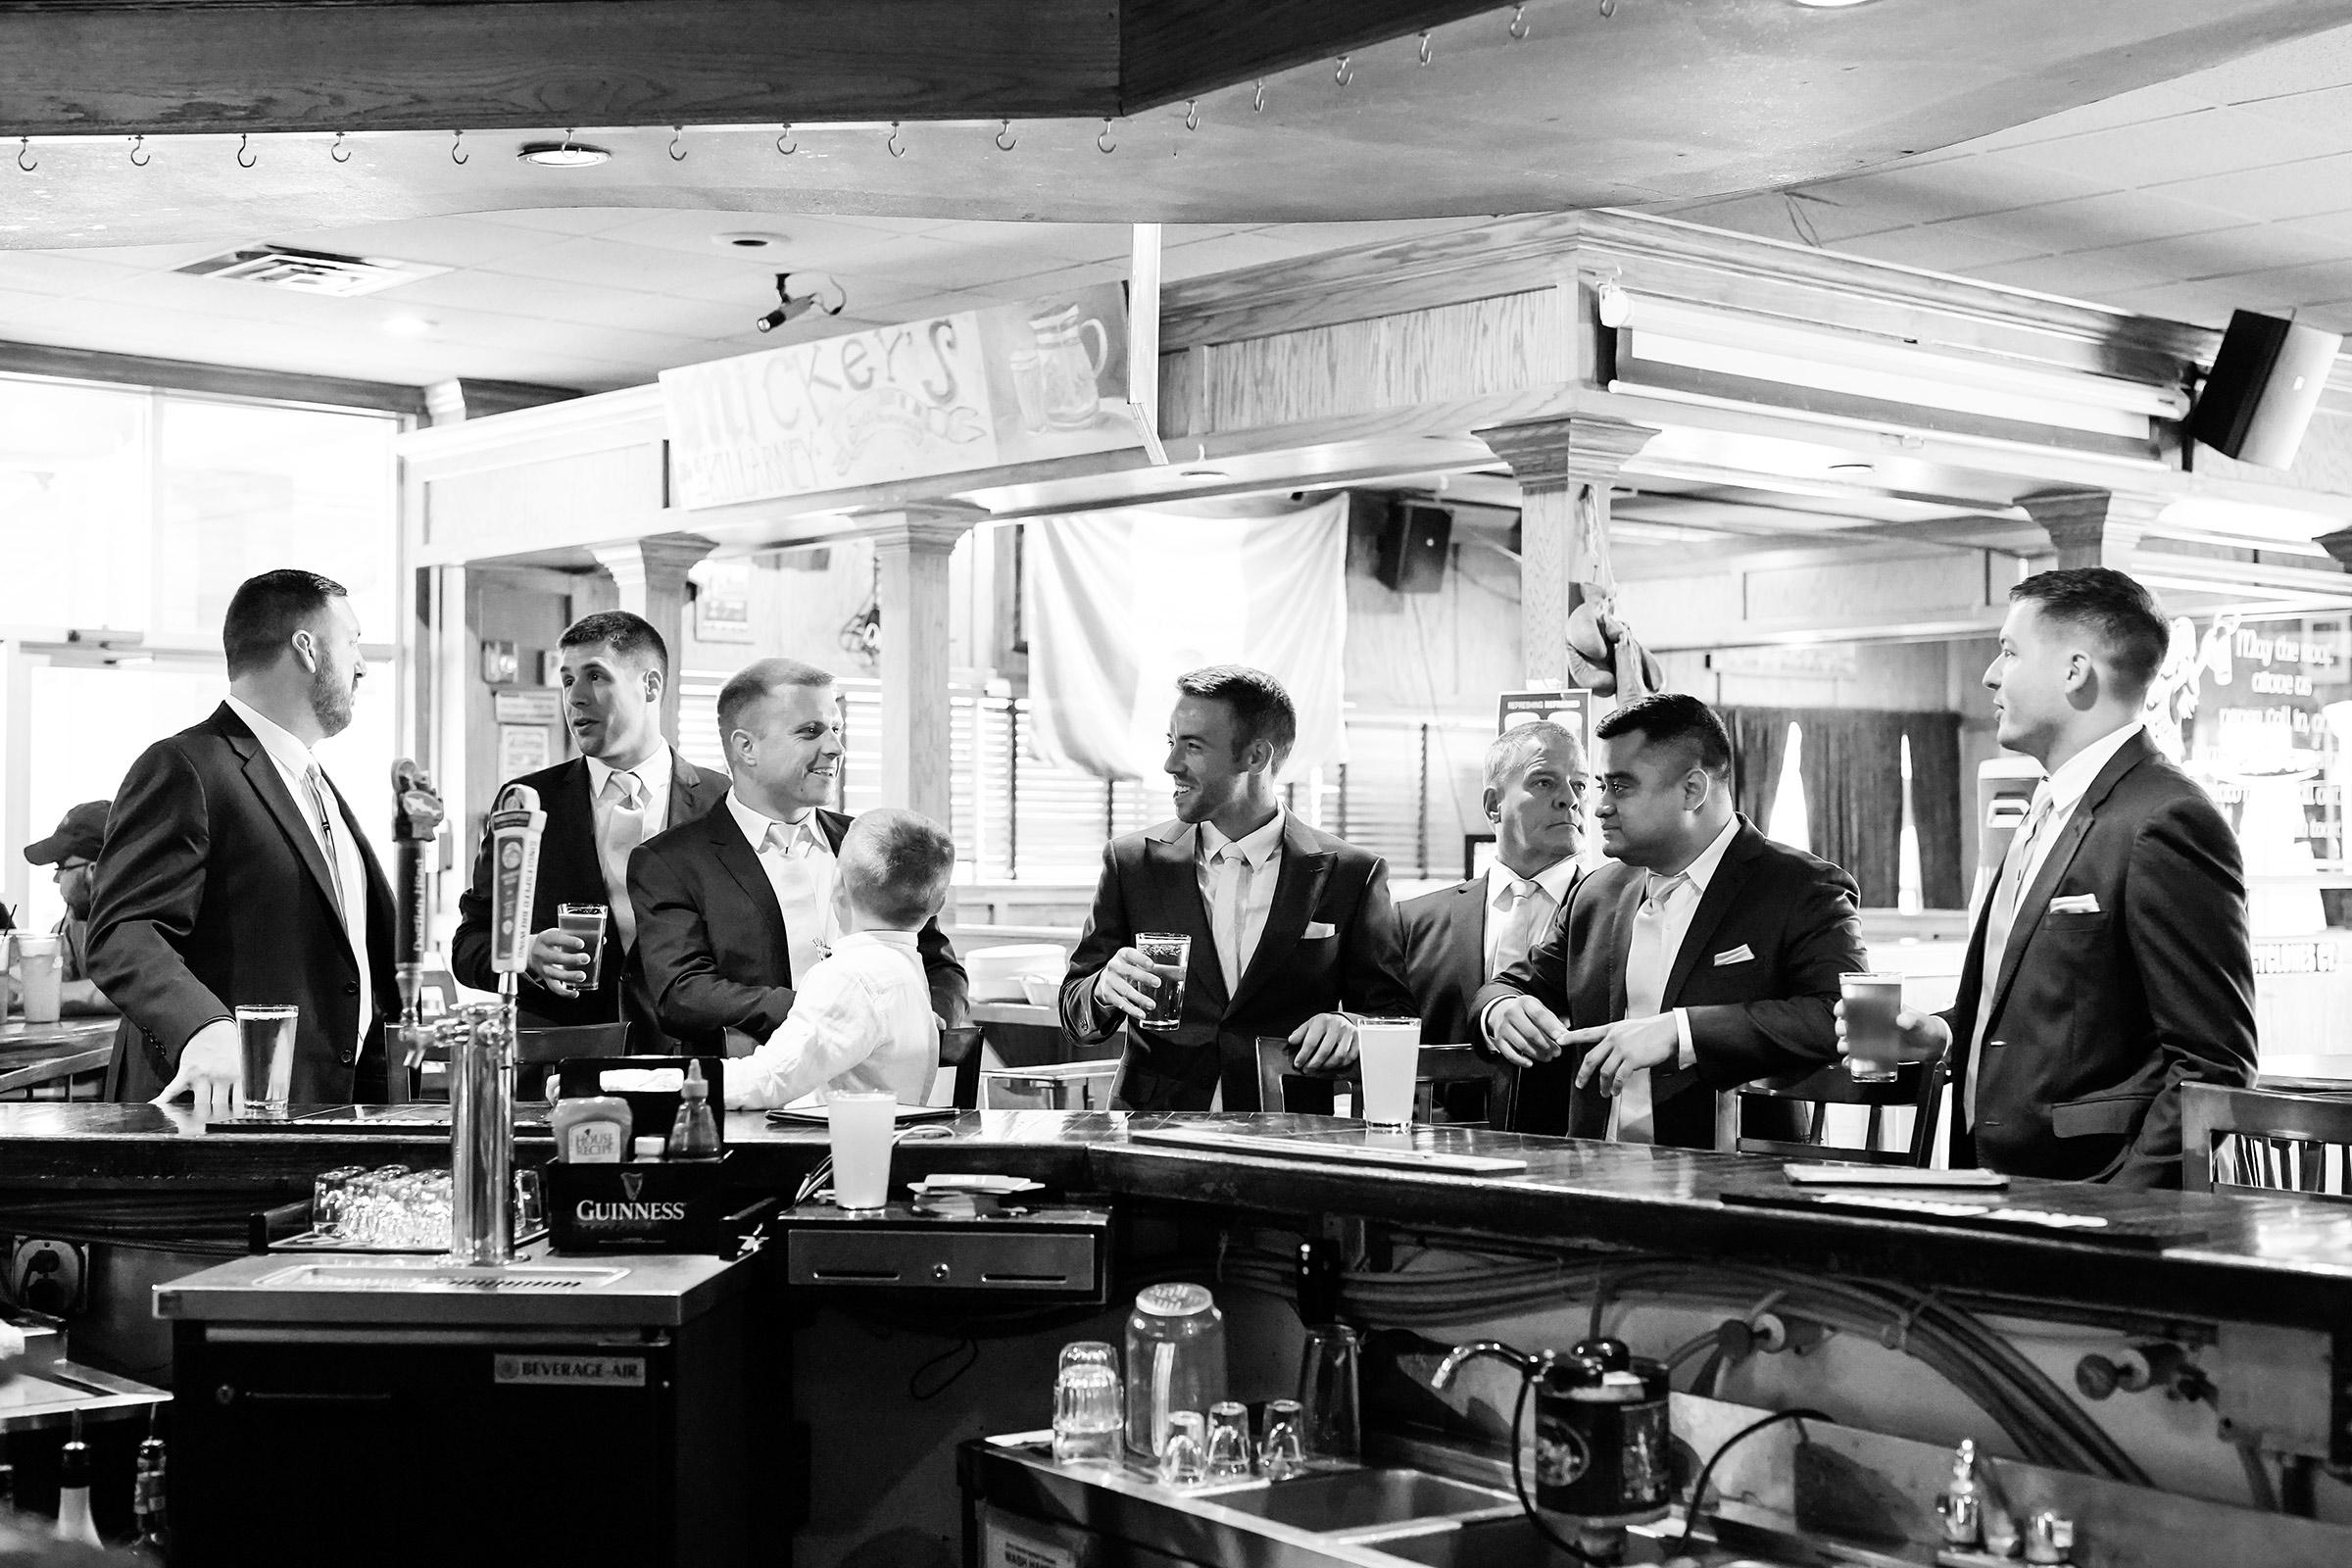 mr-mrs-hull-groom-and-groomsmen-at-mickey's-irish-pub-waukee-desmoines-iowa-raelyn-ramey-photography-161.jpg